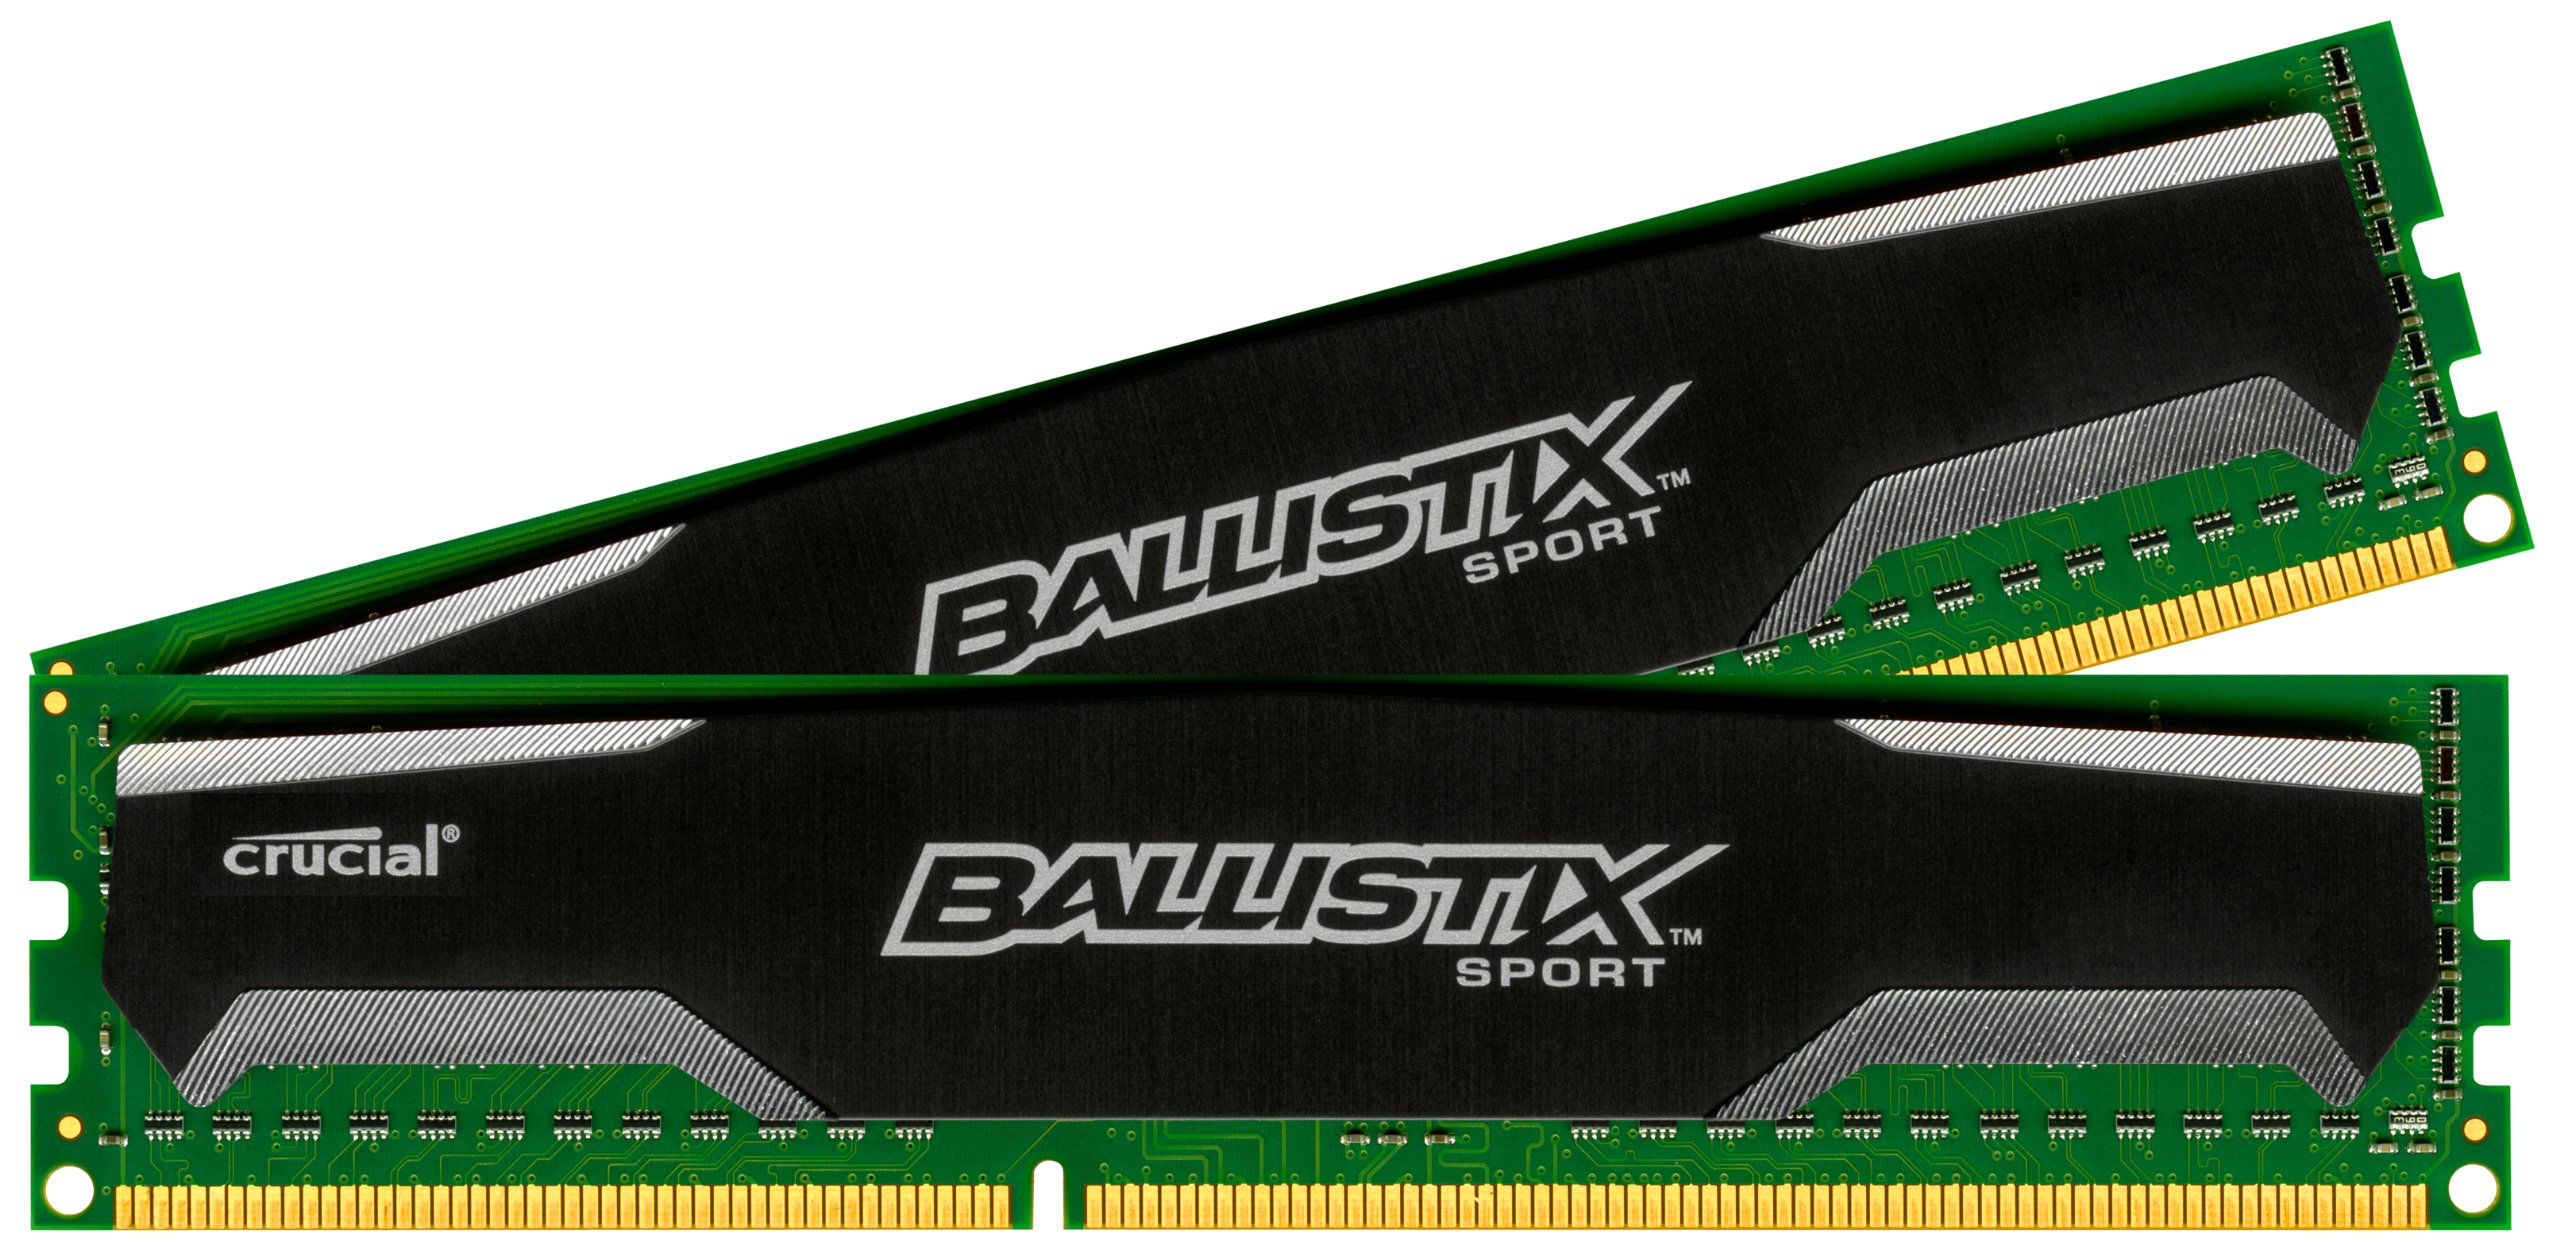 Crucial Ballistix Sport 16GB kit (8GBx2) 240-Pin DIMM Memory Module